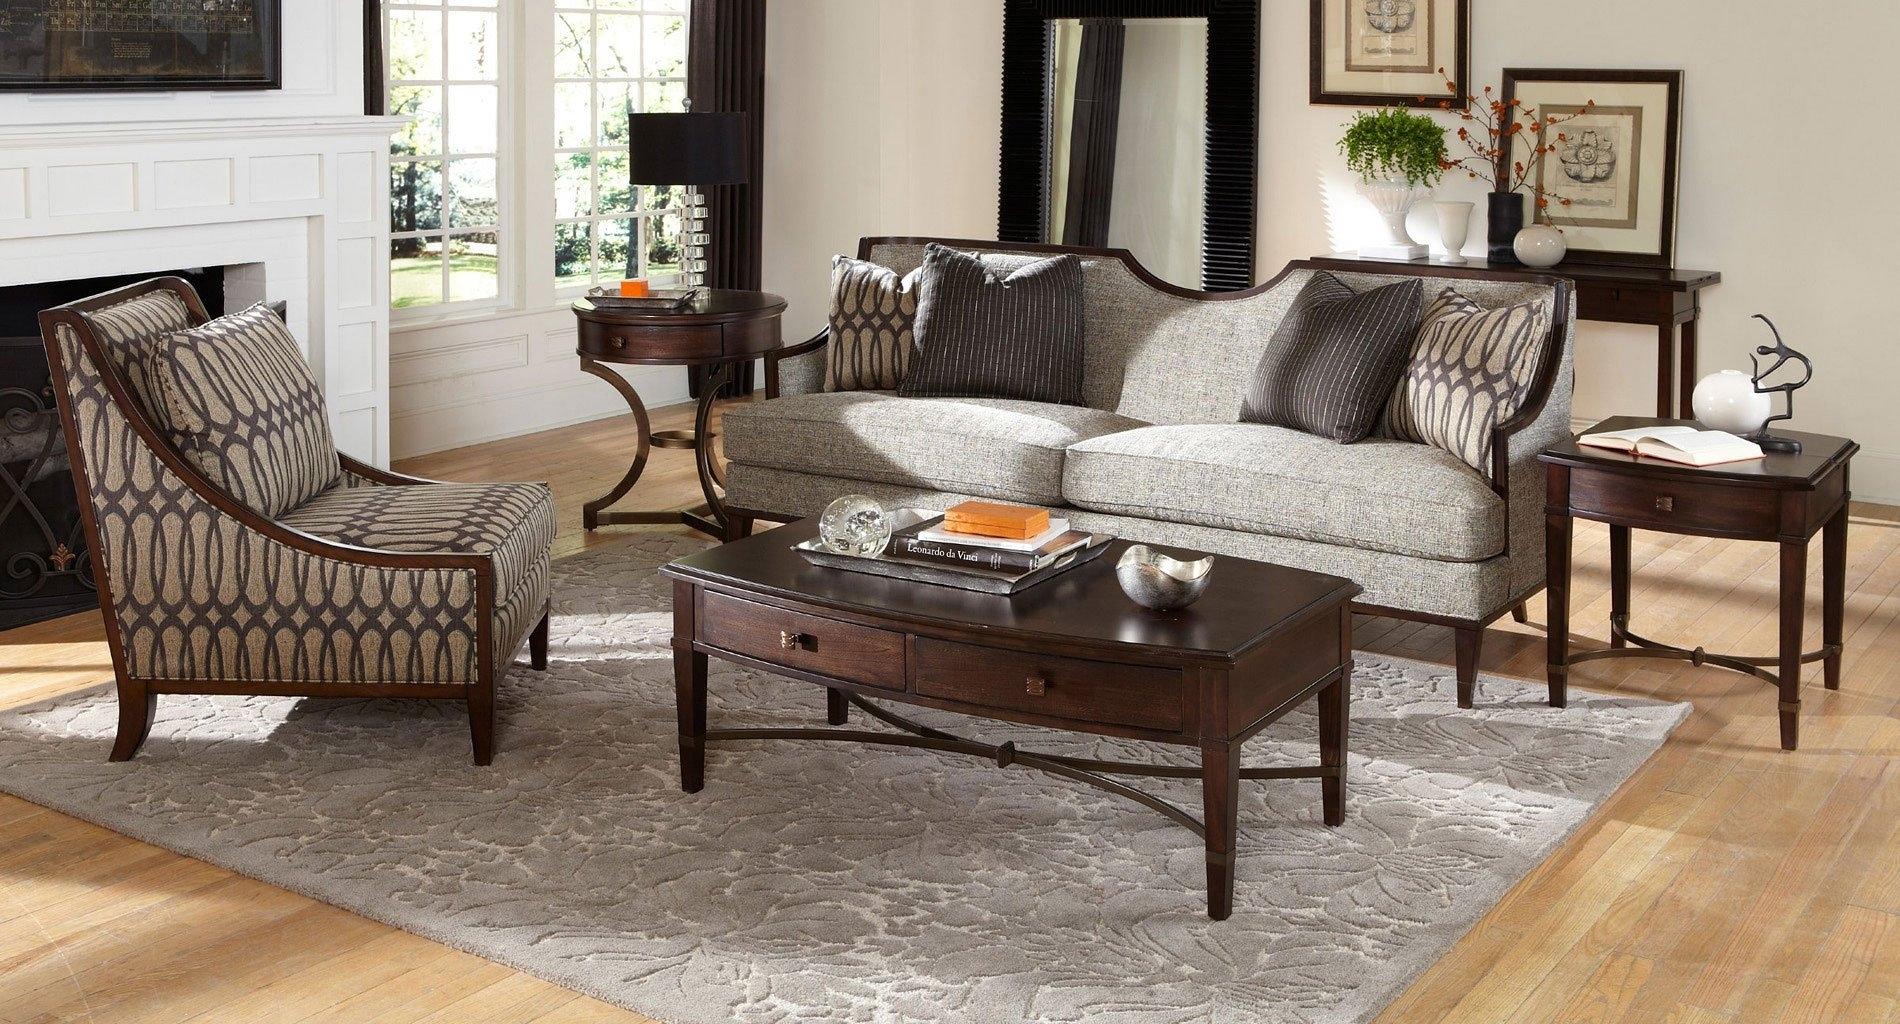 Intrigue Harper Mineral Living Room Set Art Furniture | Furniture Cart Intended For Harper Down 3 Piece Sectionals (Image 13 of 25)